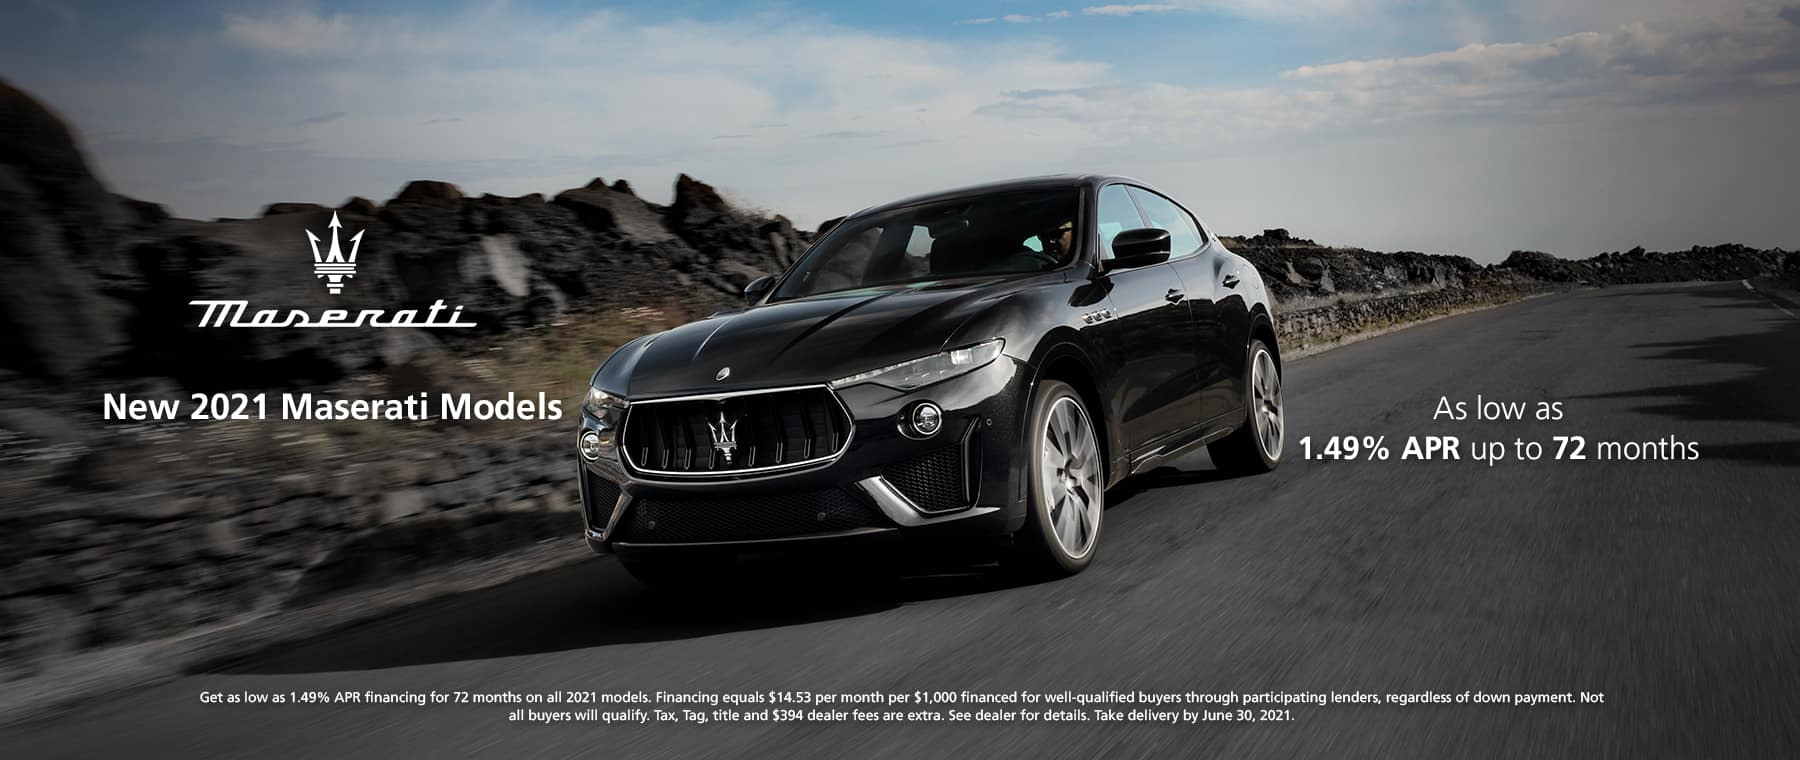 MAS6086_BAG_MaseratiAllen_21Jun_Sales_MaseratiModelsMY21_1800x760